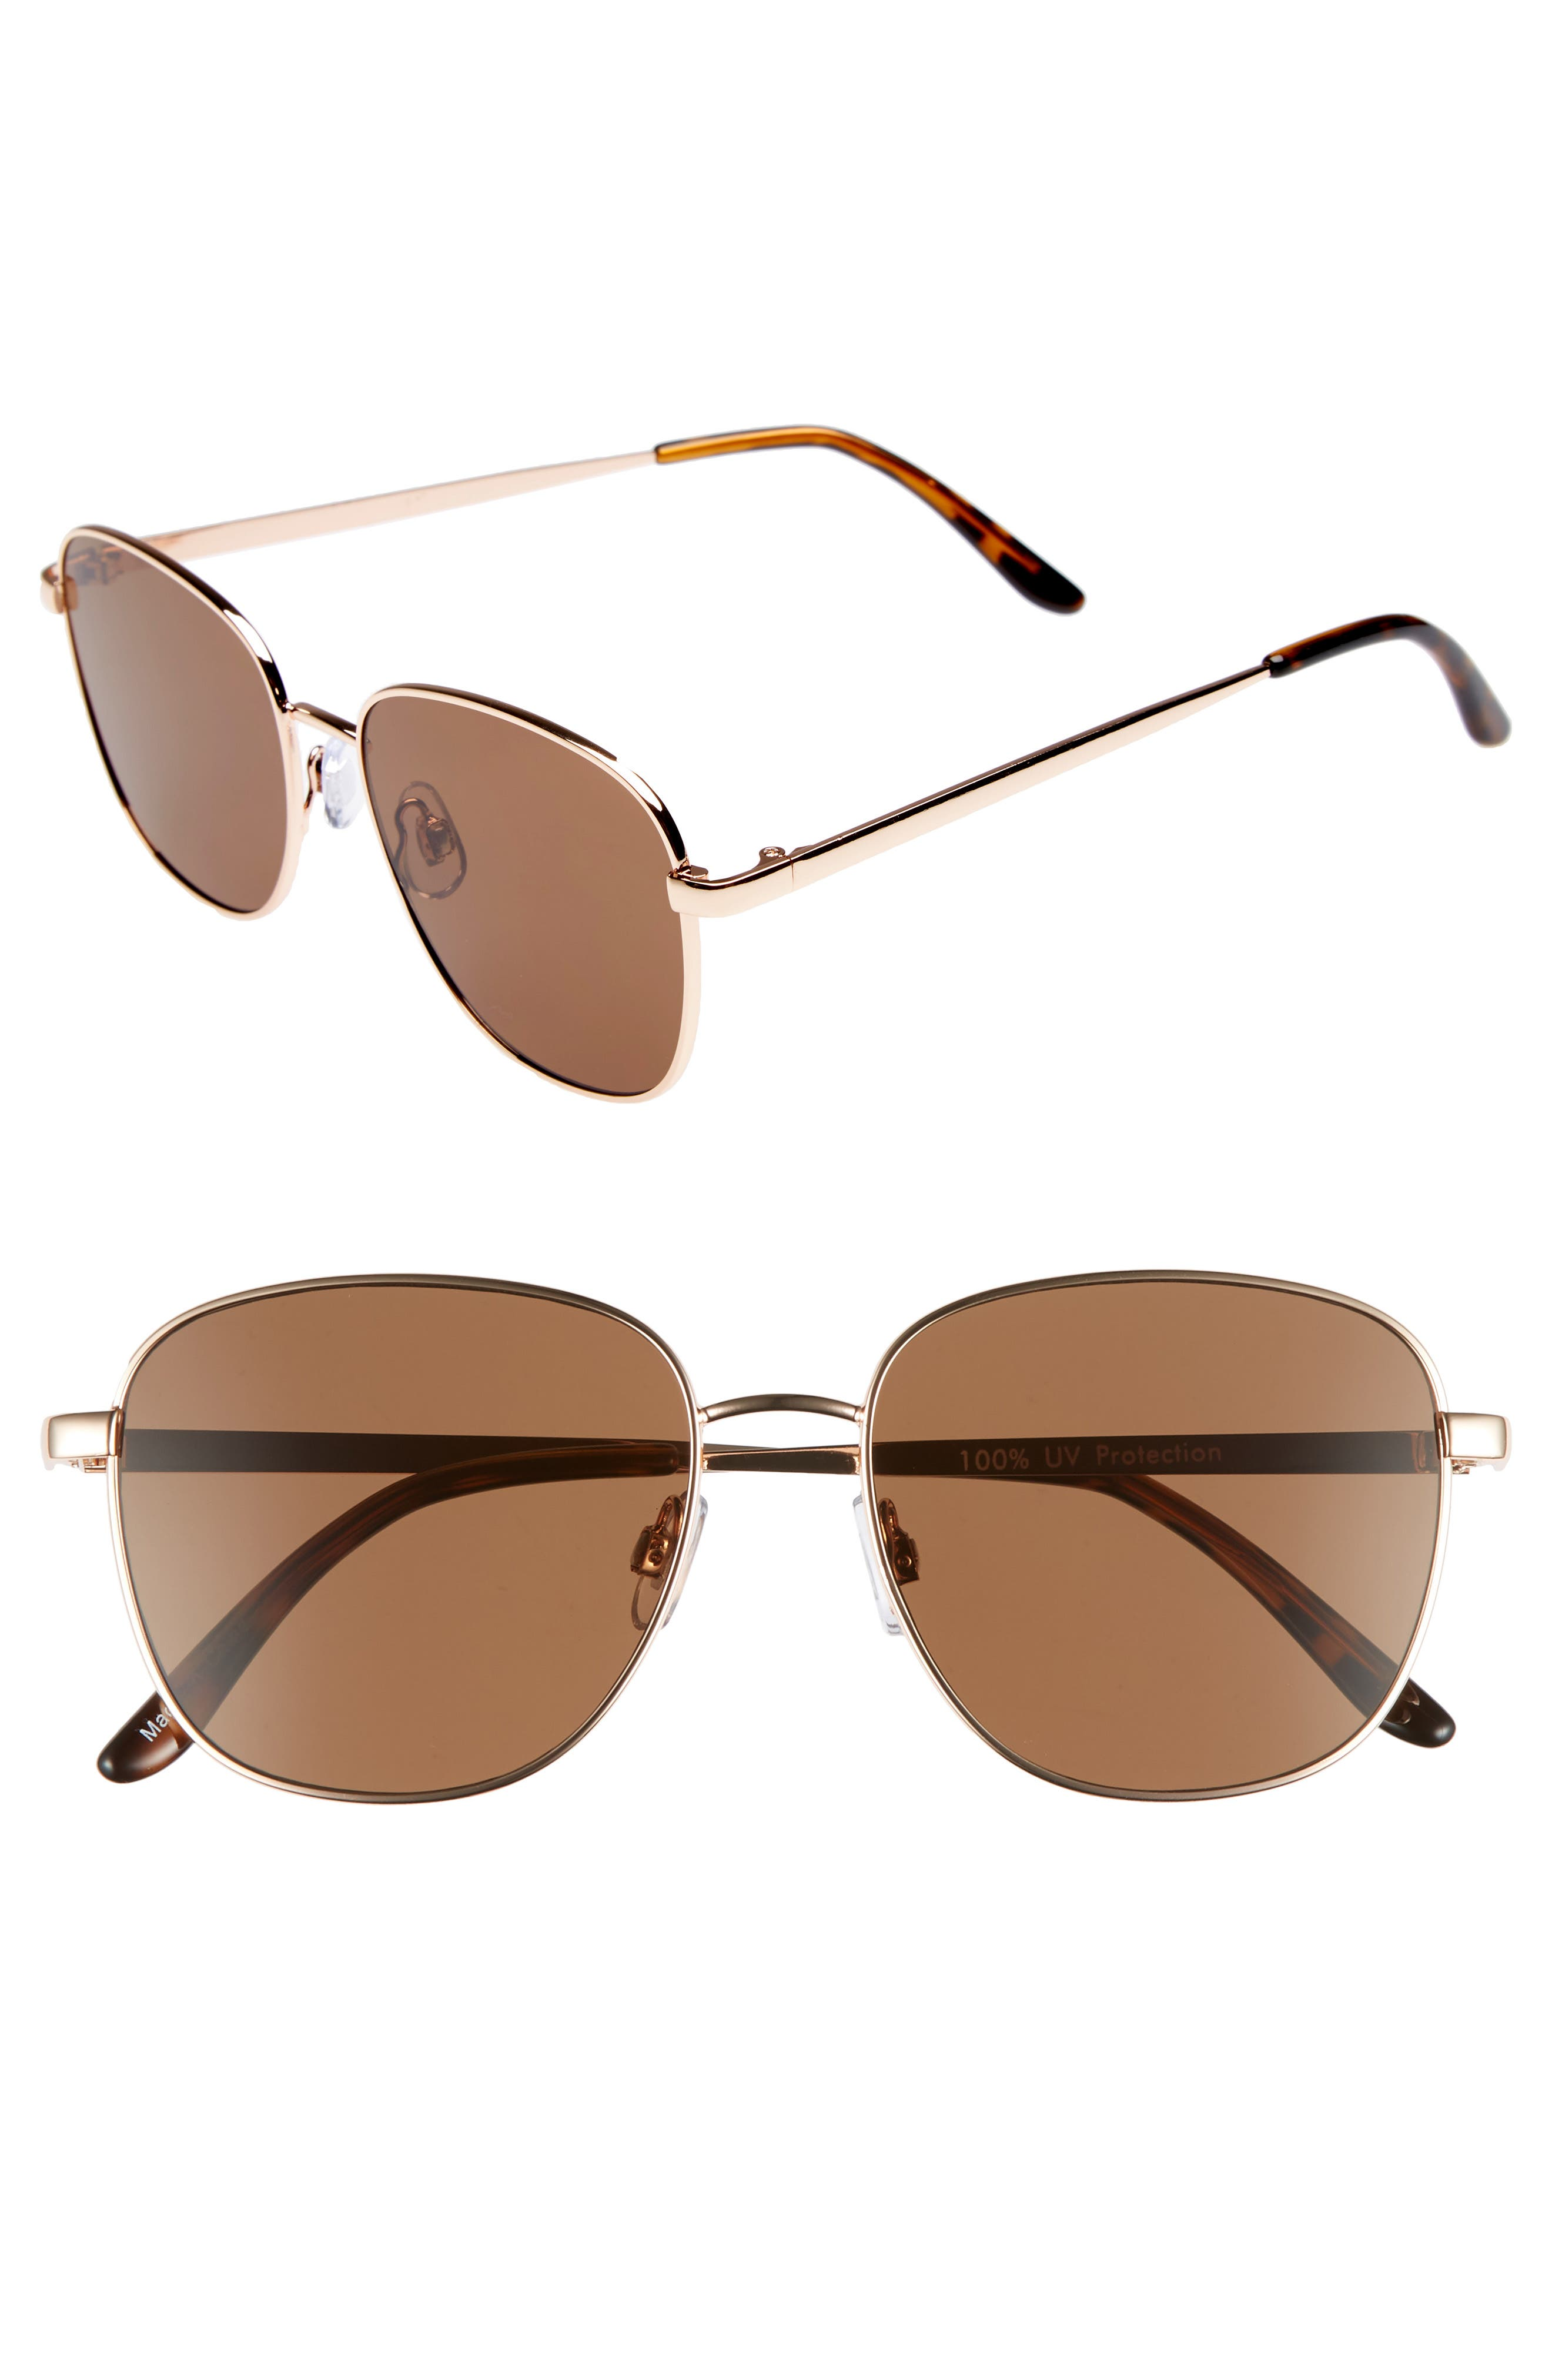 53mm Square Sunglasses,                             Main thumbnail 1, color,                             710